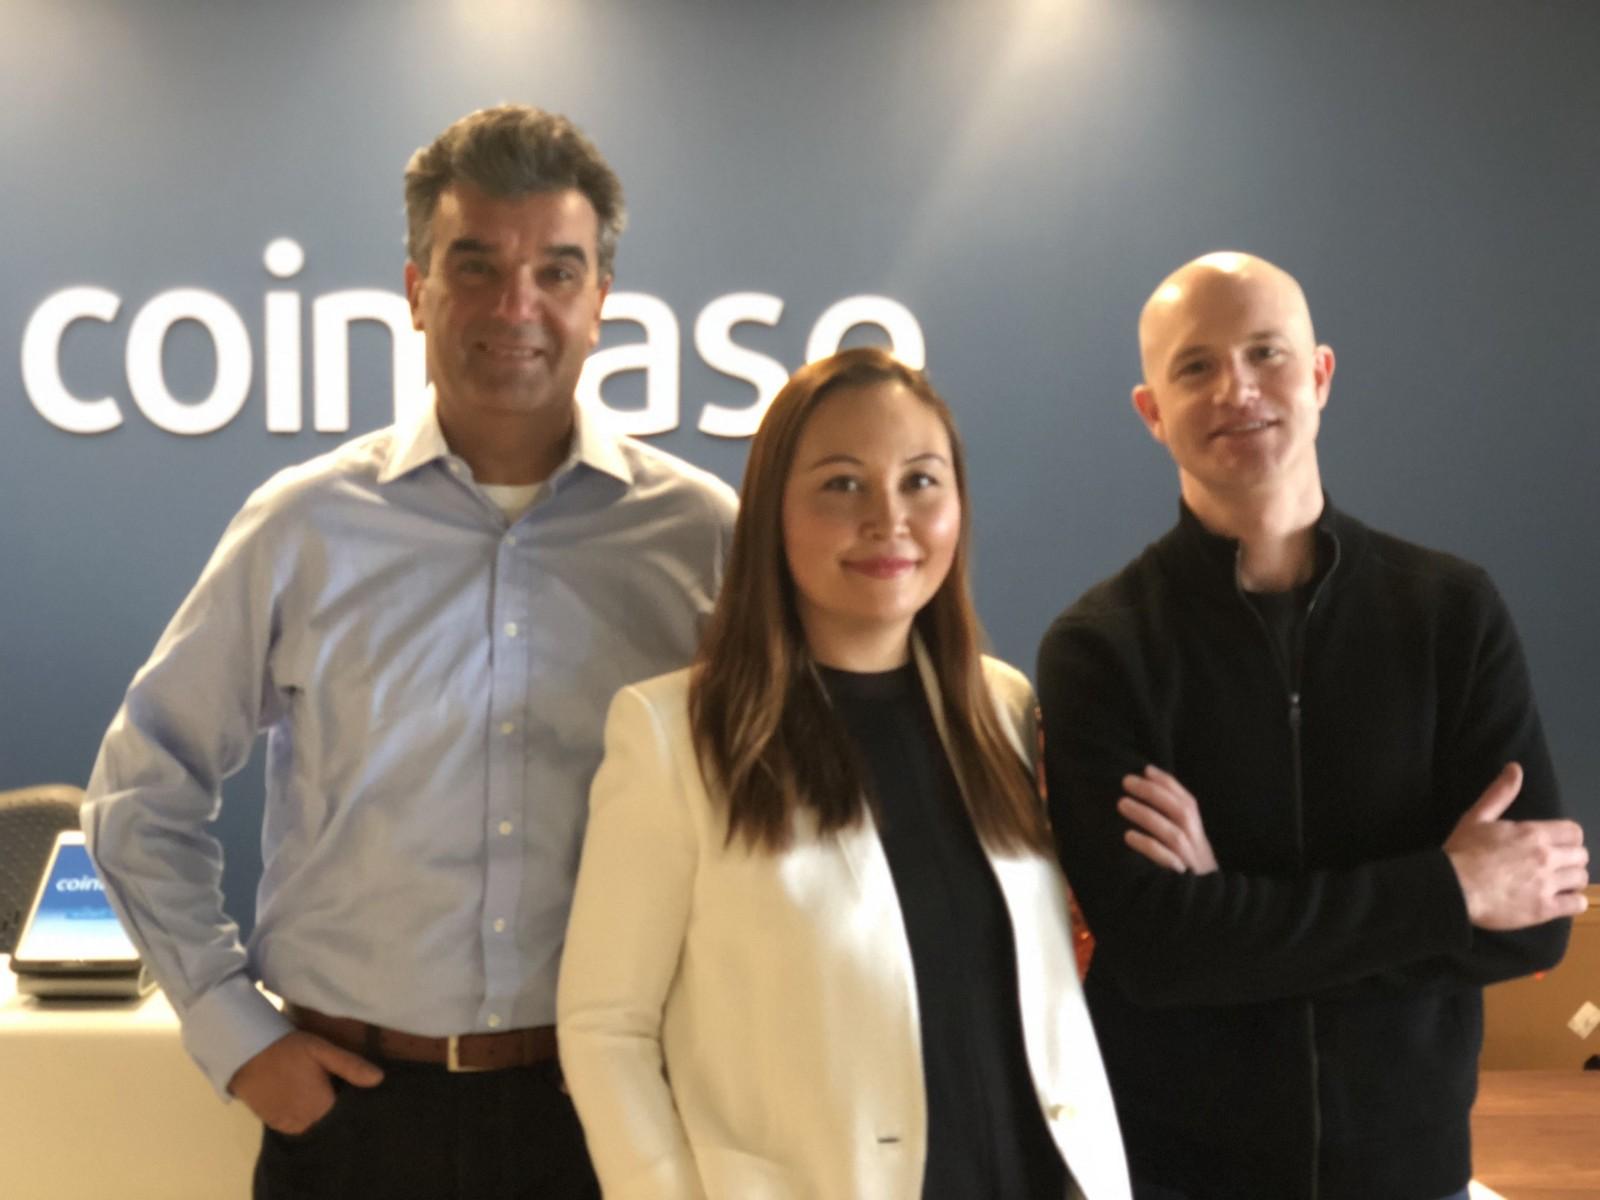 Экс-менеджер LinkedIn Эмили Чои заняла должность вице-президента Coinbase